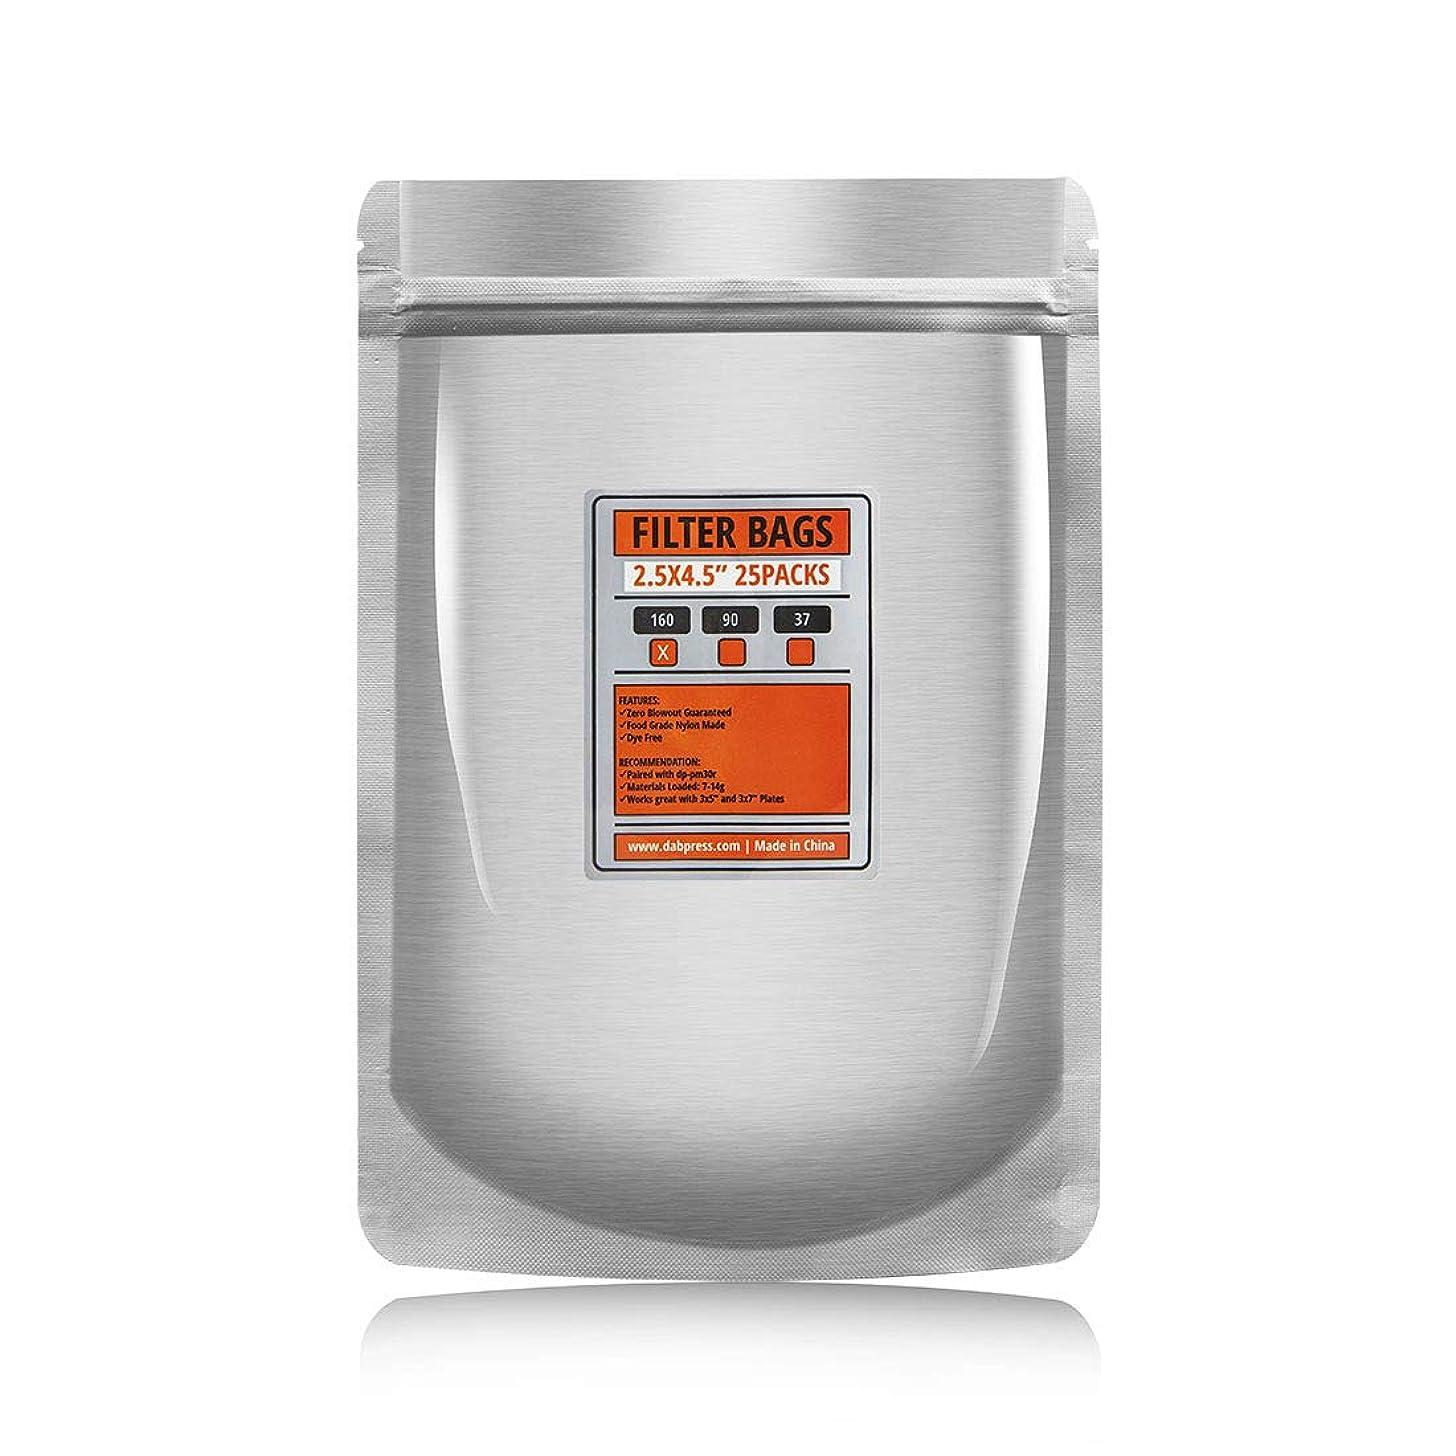 iBudtek 2.5x4.5 Inch | 160 Micron Press Bags | Nylon Tea Filter Press Screen Bags | 25 Bags Per Package | Pair It with dp-pm40r PrePress Mold